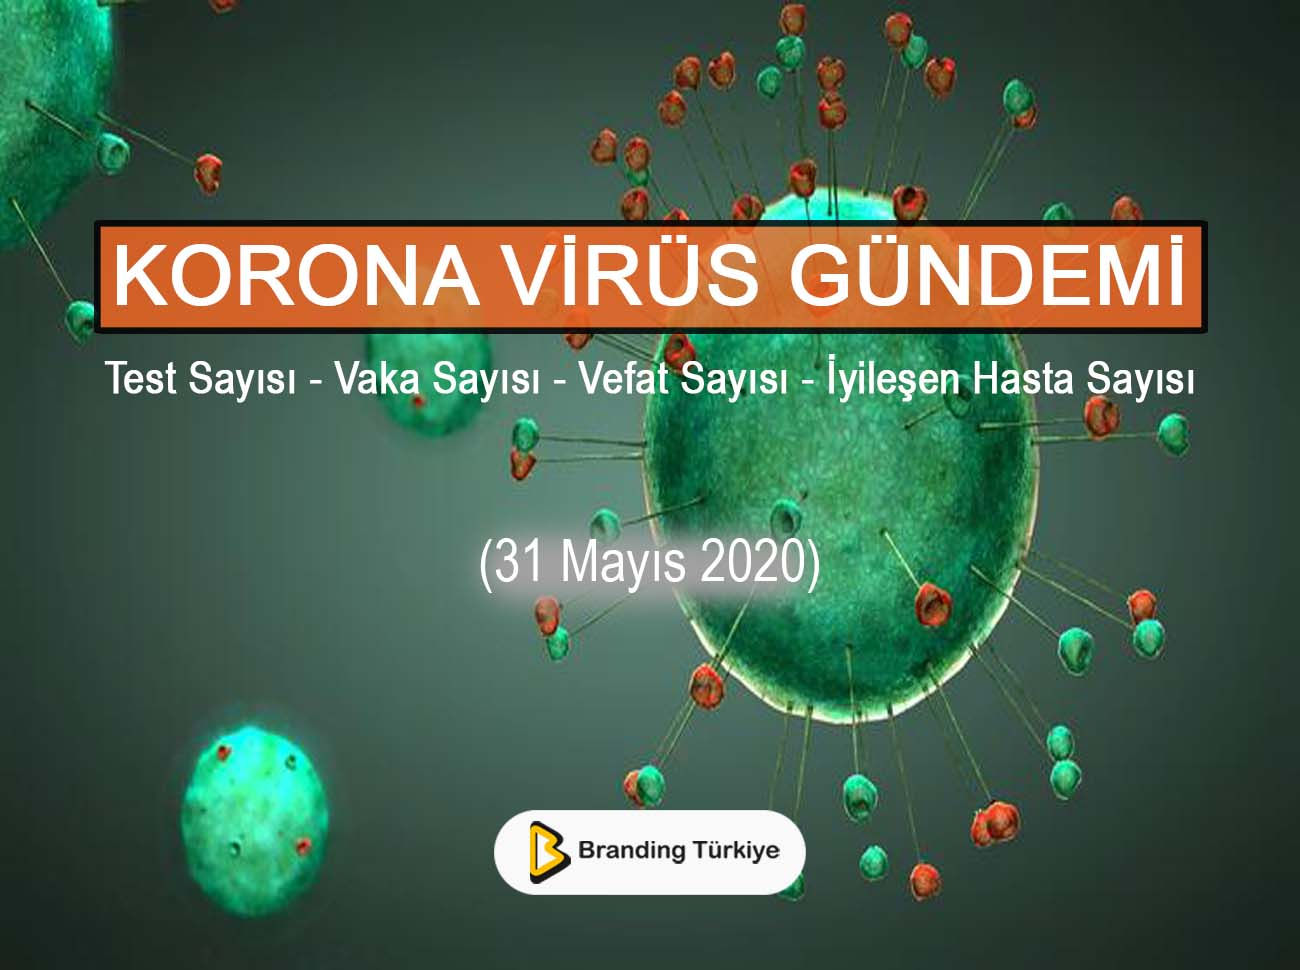 Korona Virüs Gündemi (31 Mayıs 2020)